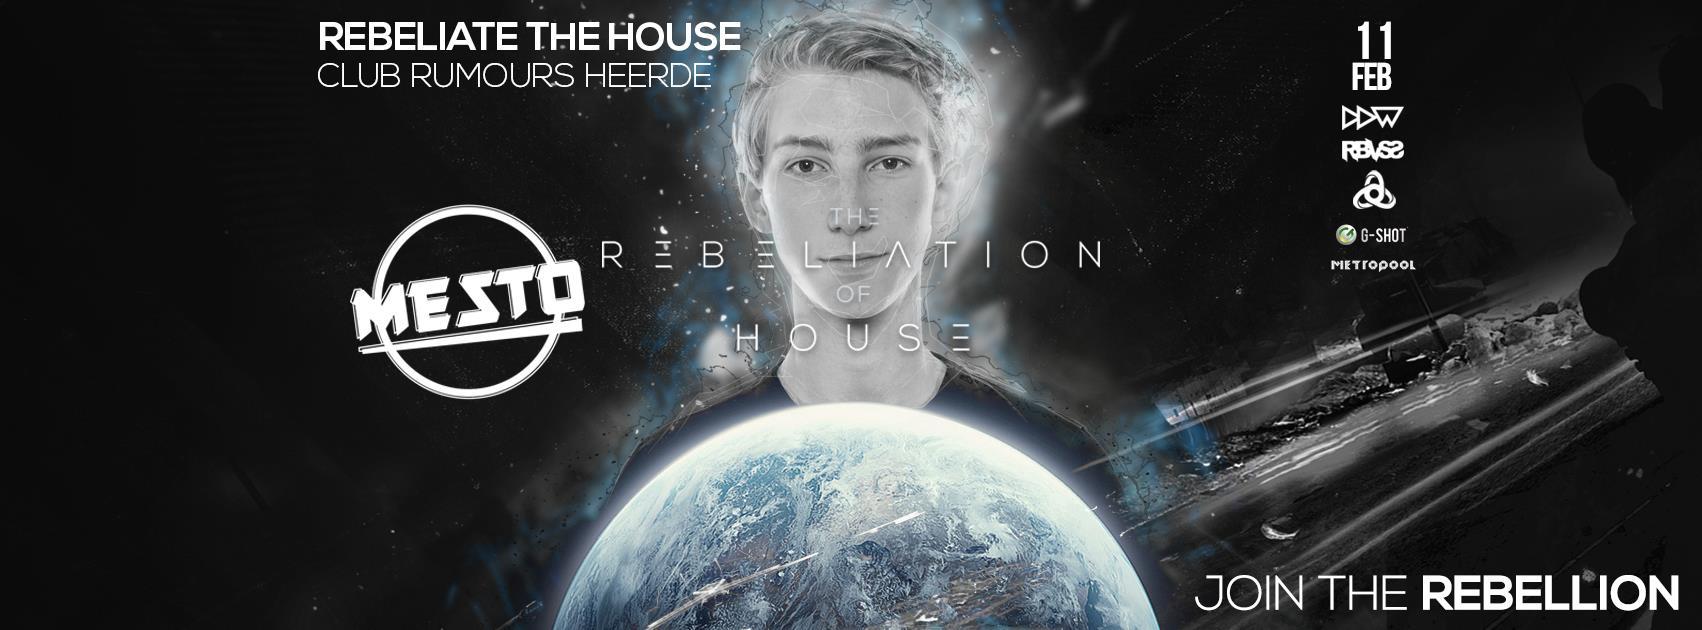 Rebeliate the House w / Mesto